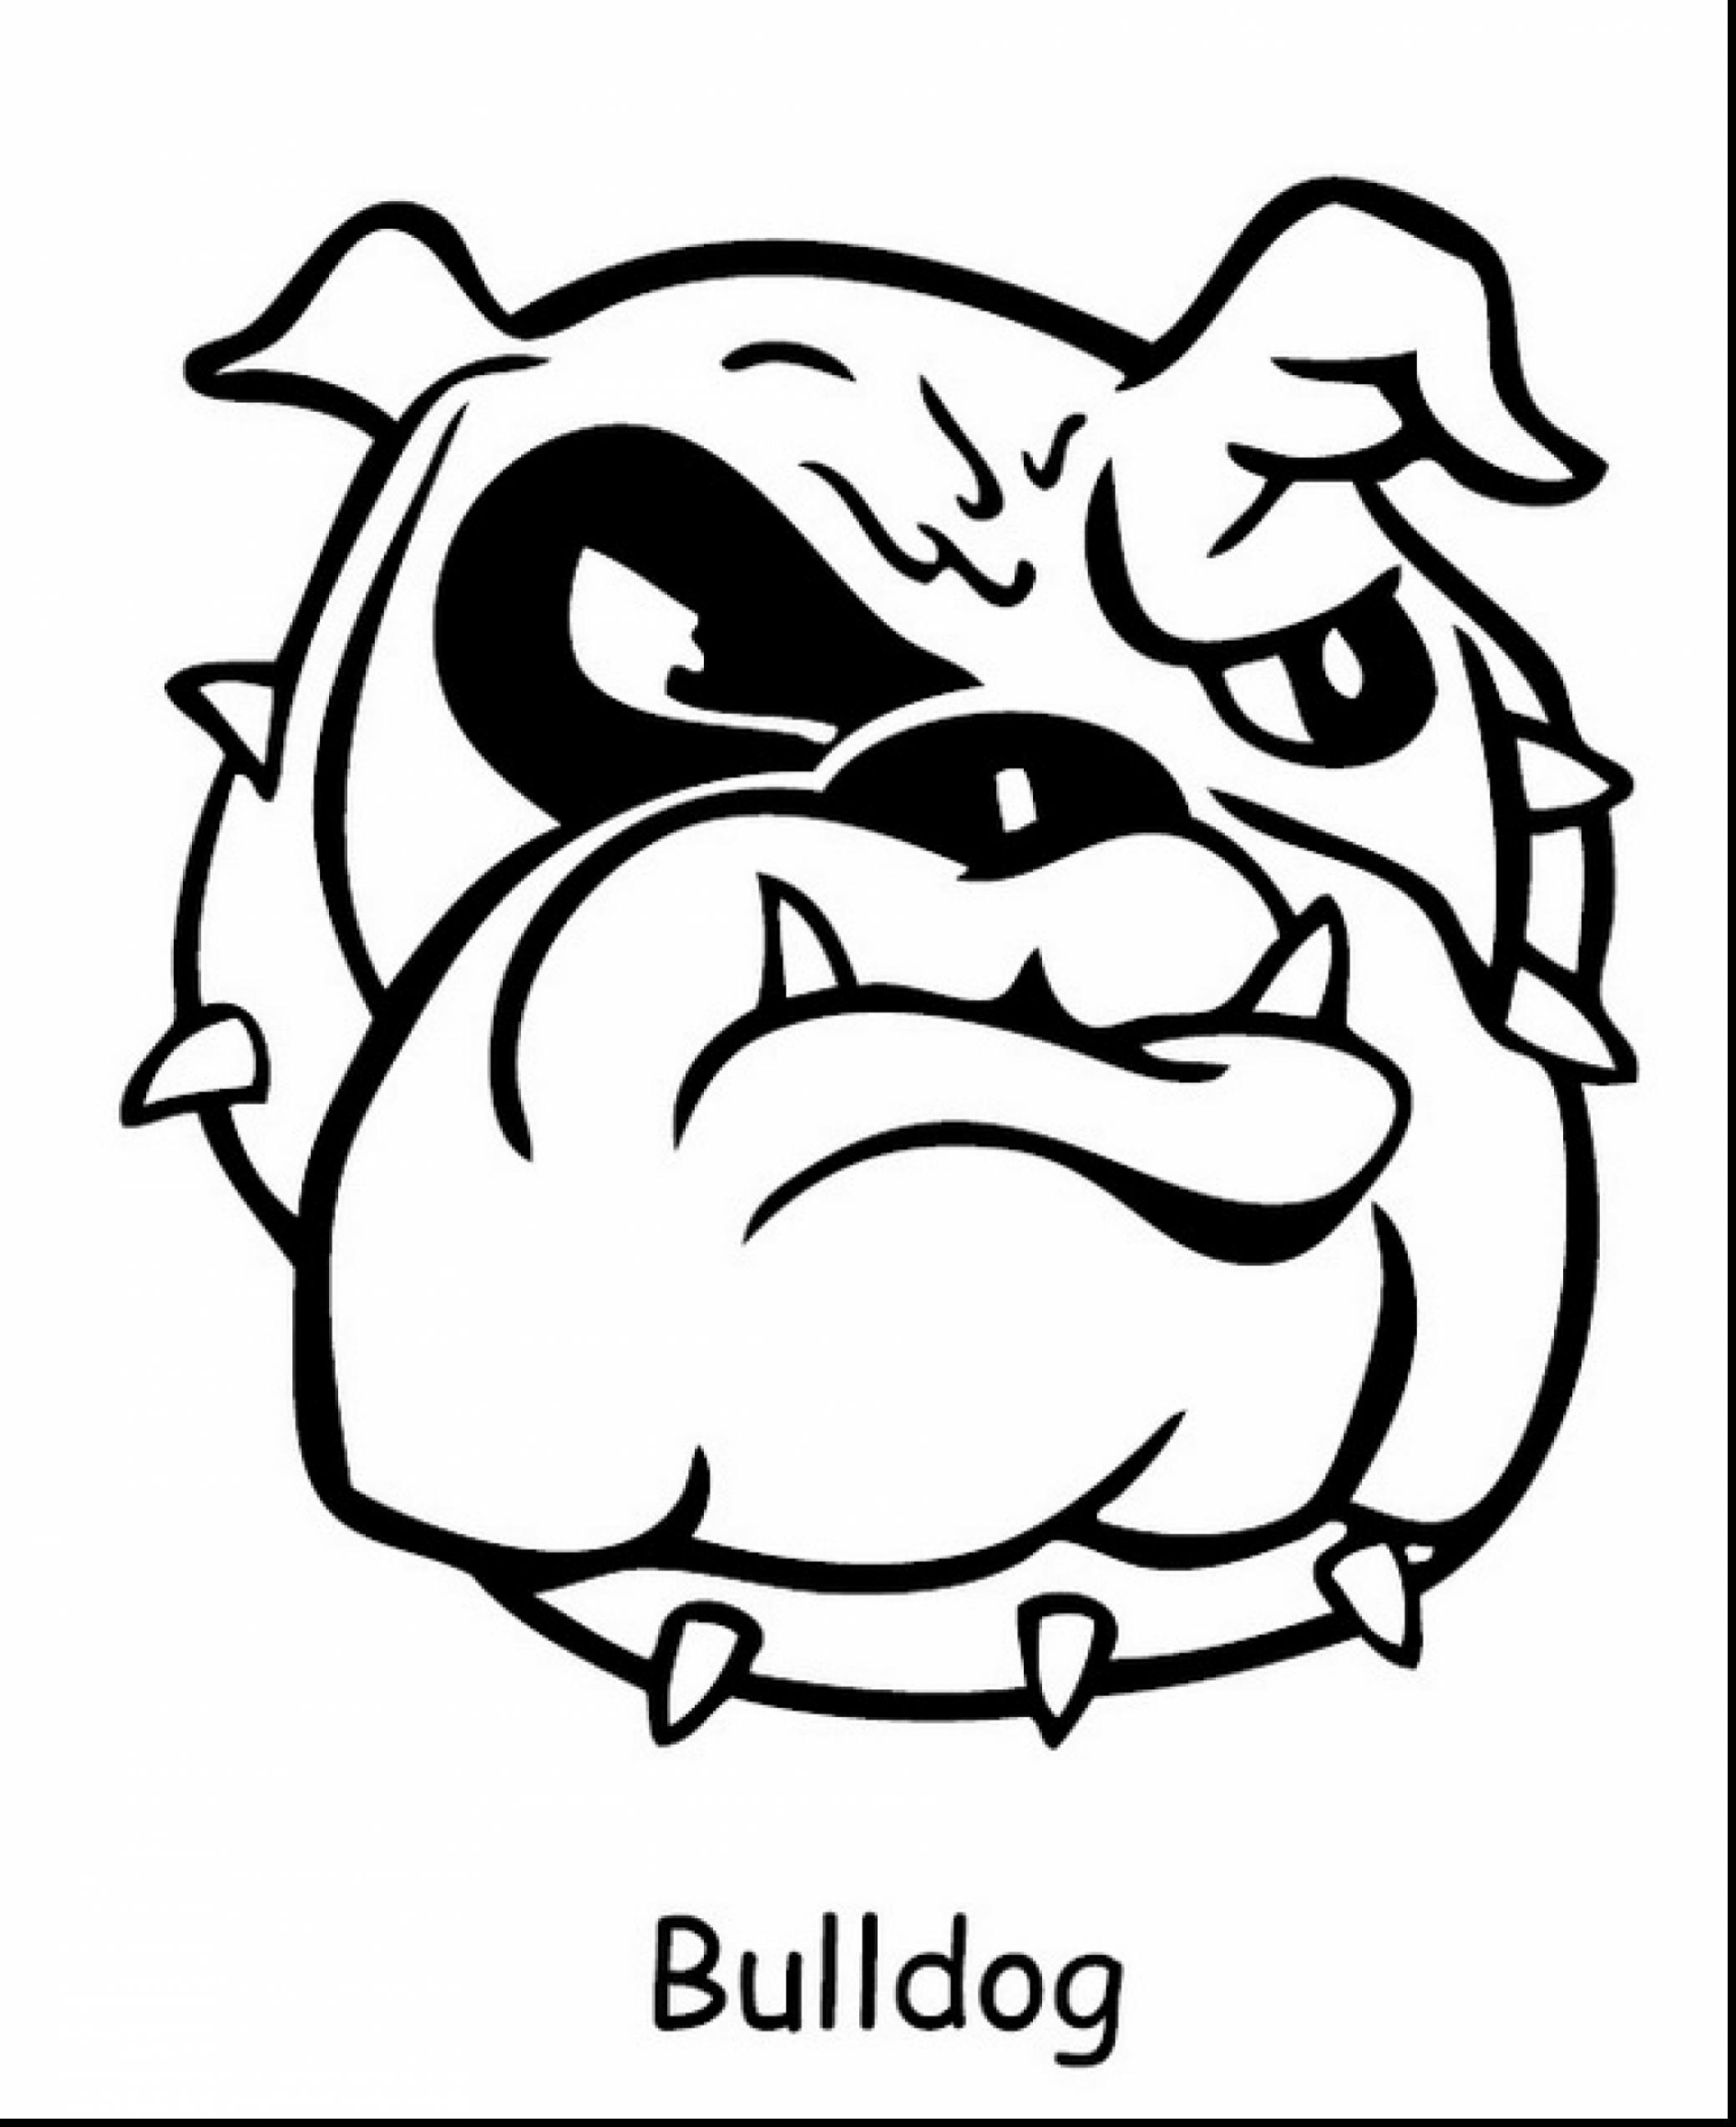 bulldog coloring pages bulldog coloring pages getcoloringpagescom coloring bulldog pages